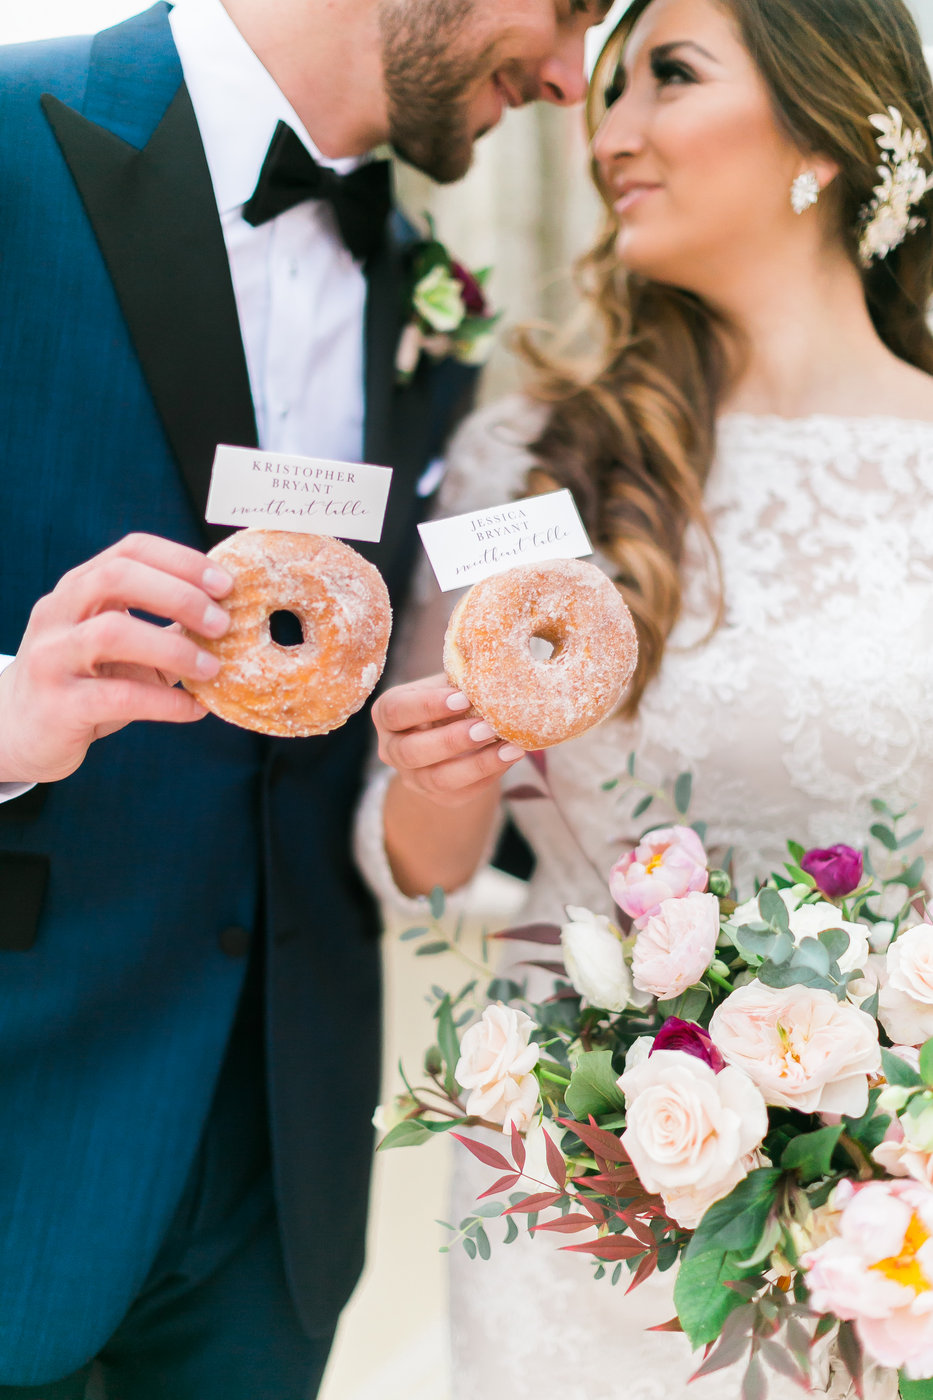 wedding place cards donuts las vegas wedding planner .jpg